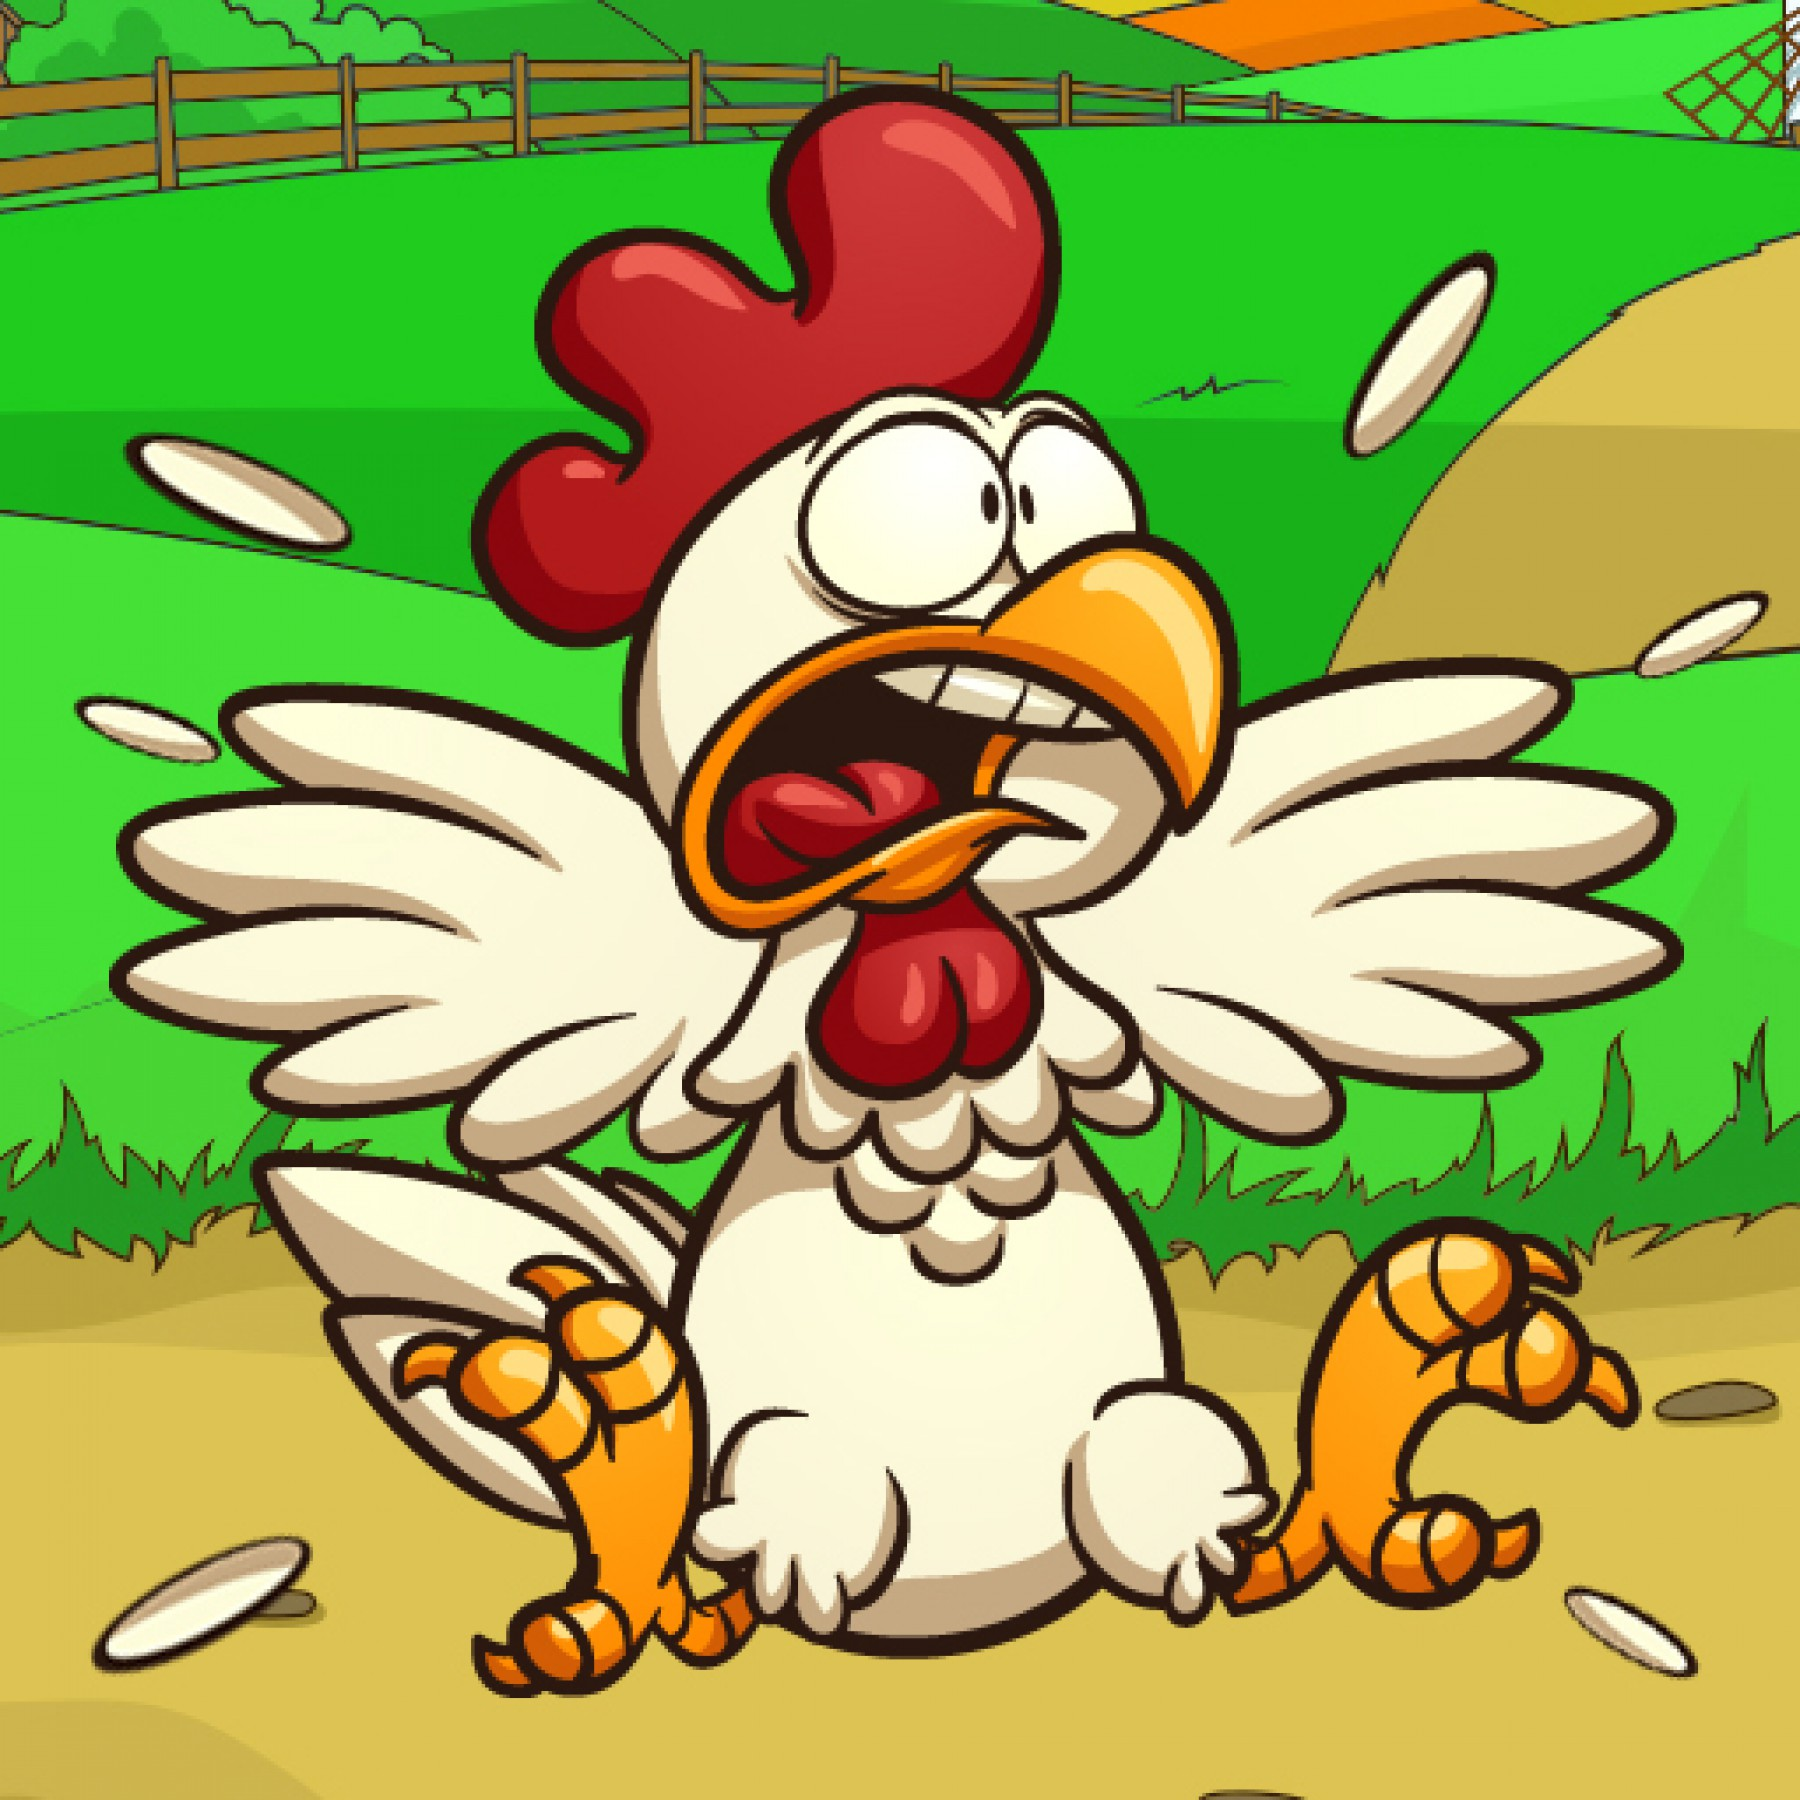 splat-the-chicken-playtime-active-kids-main-location